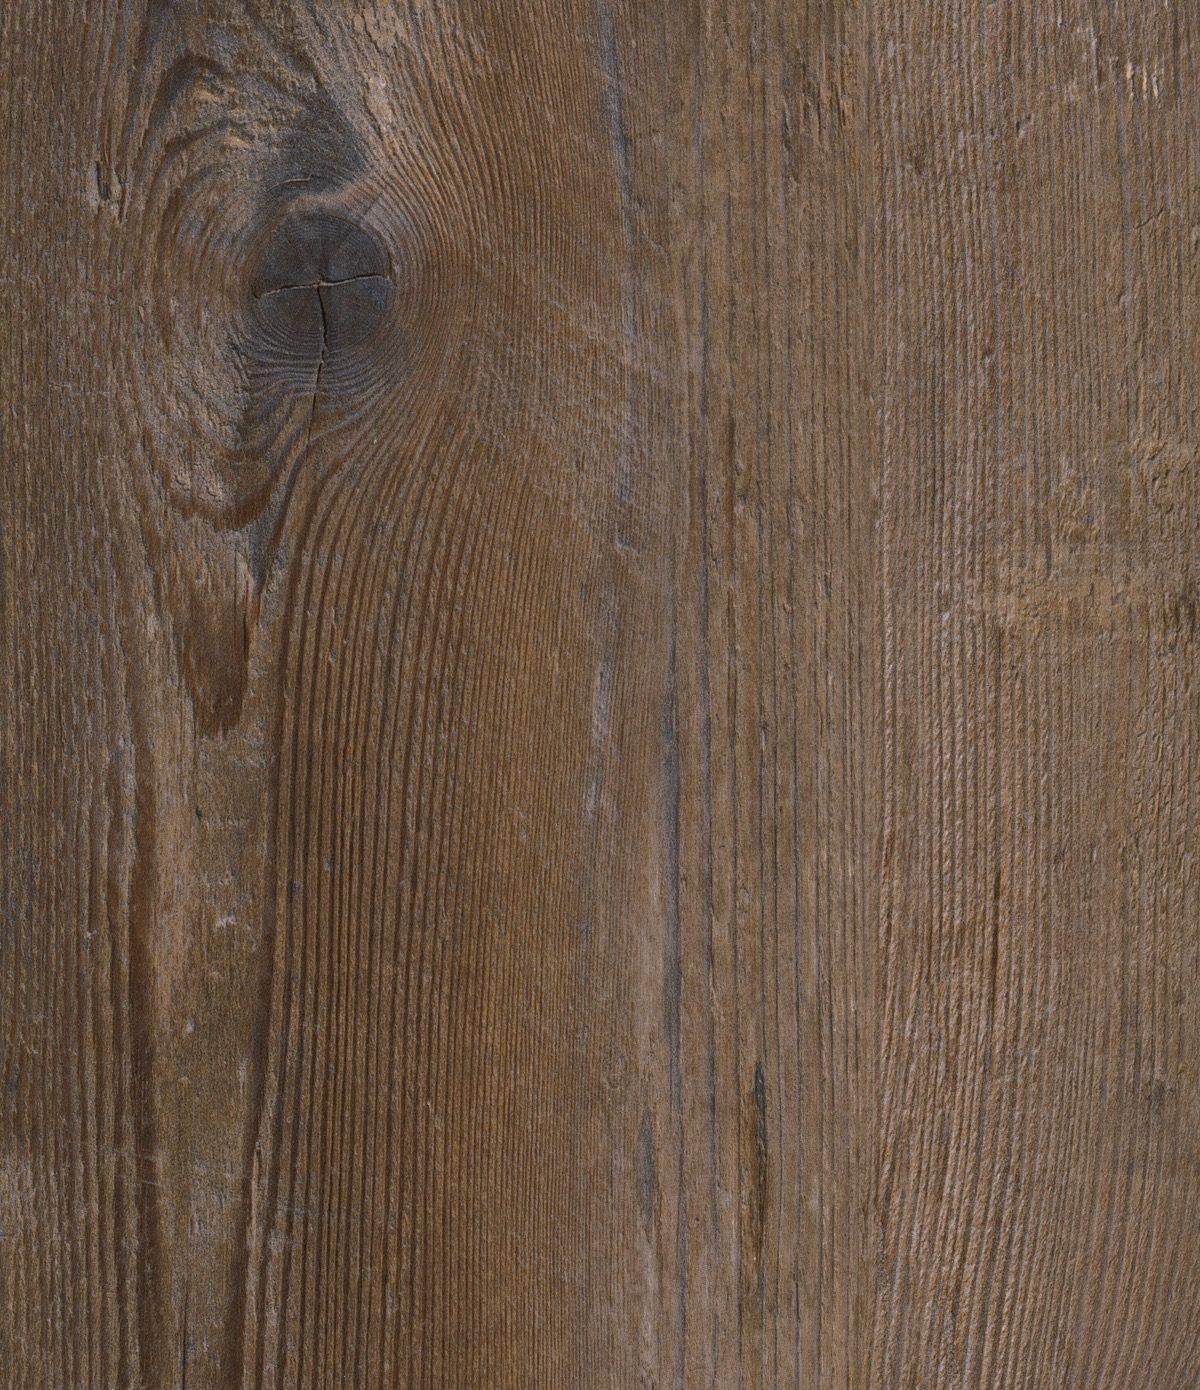 Whiskey Barrel Oak Hand Scraped Flooring Final Vinyl Waterproof Flooring Cabinets To Go Flooring